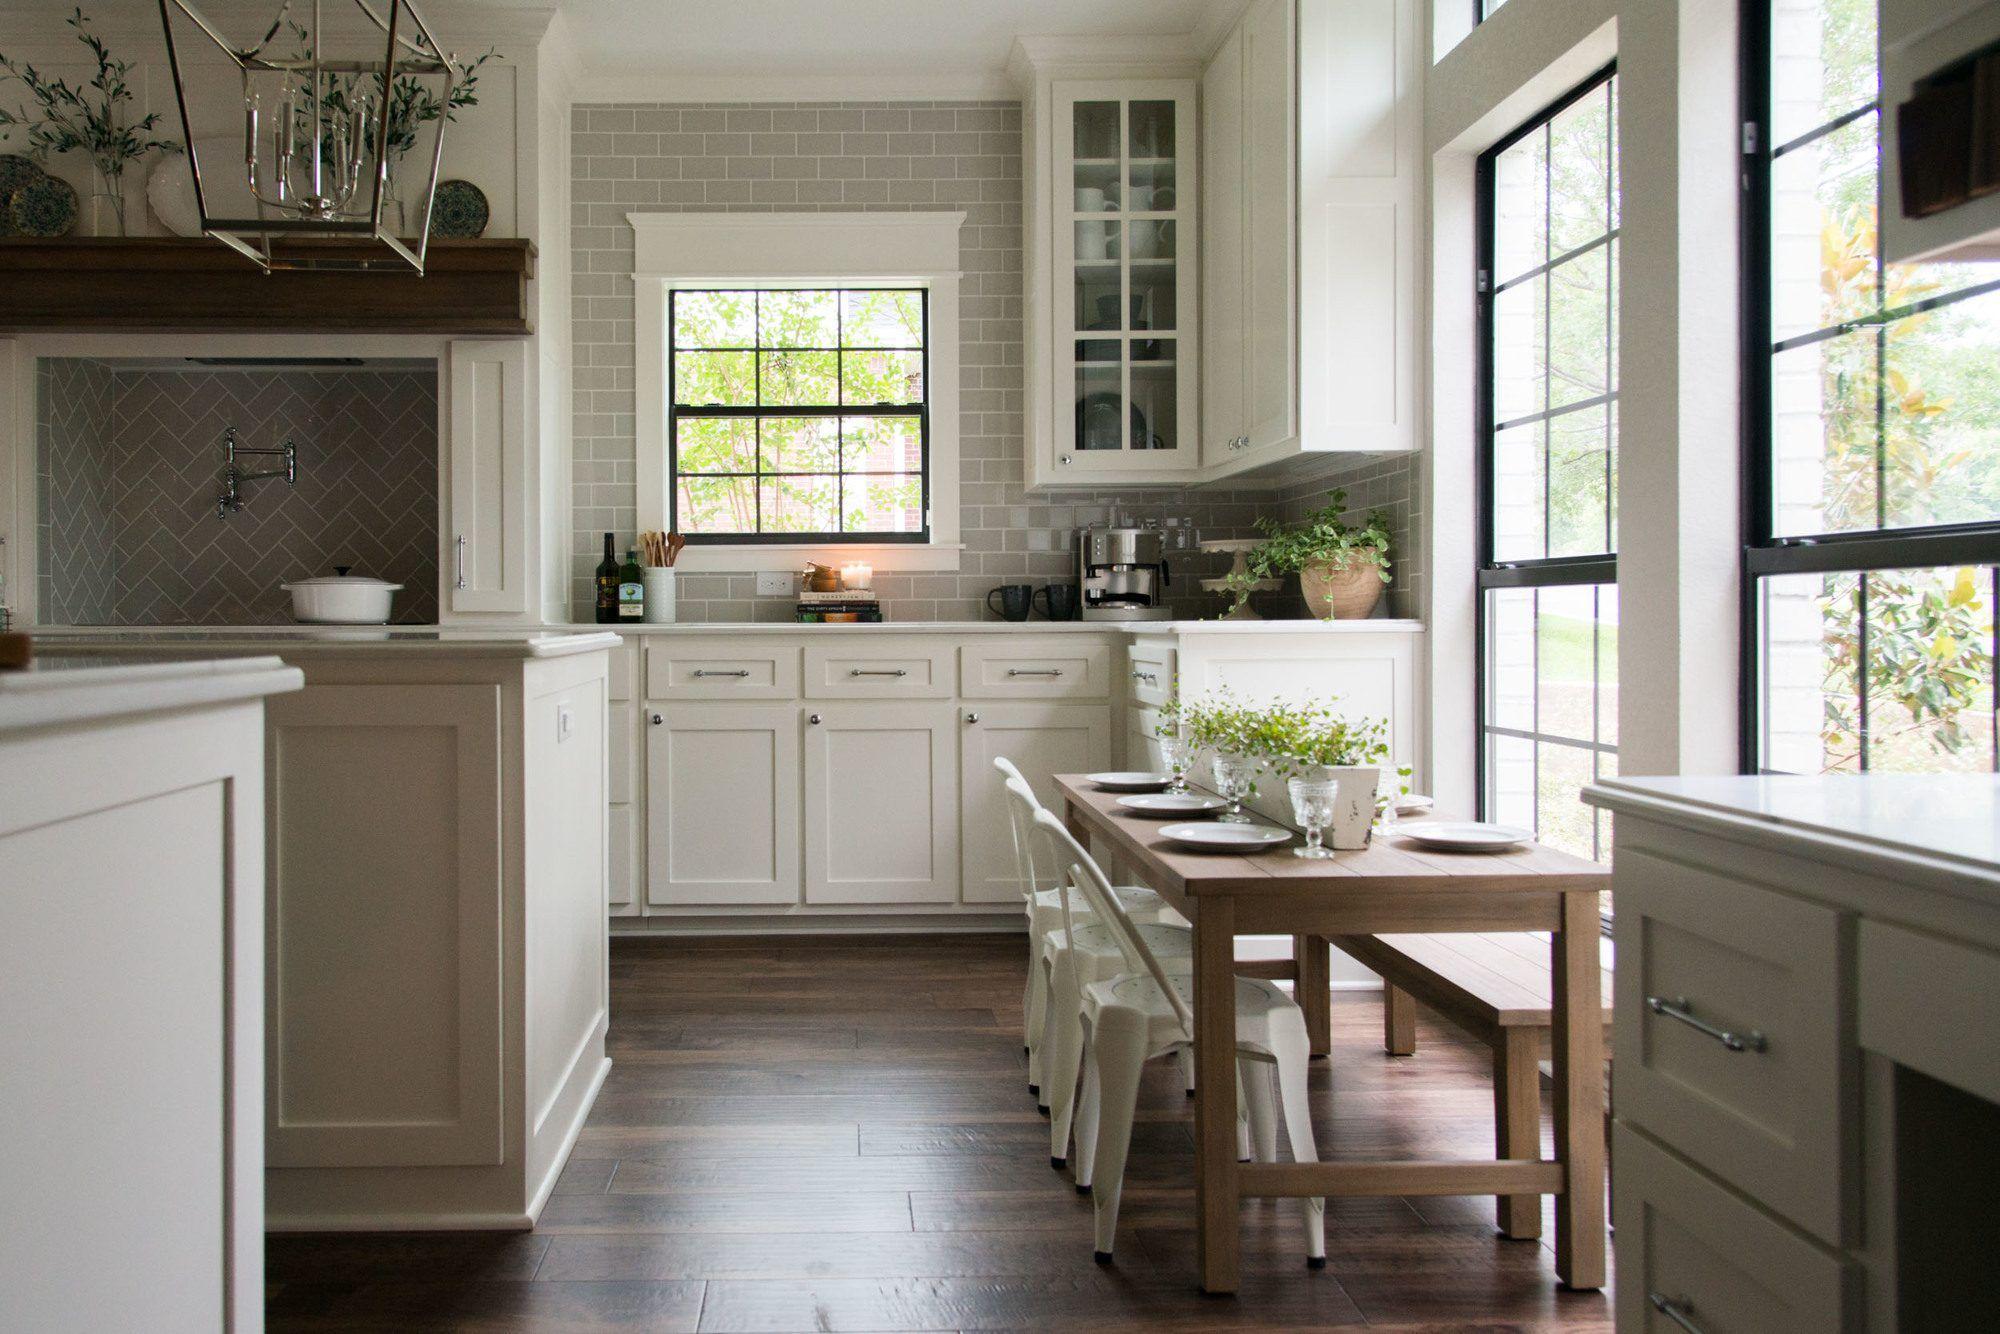 Fixer upper kitchen windows - Season 4 Episode 8 Fixer Upper Design Elements The Straight 80s House